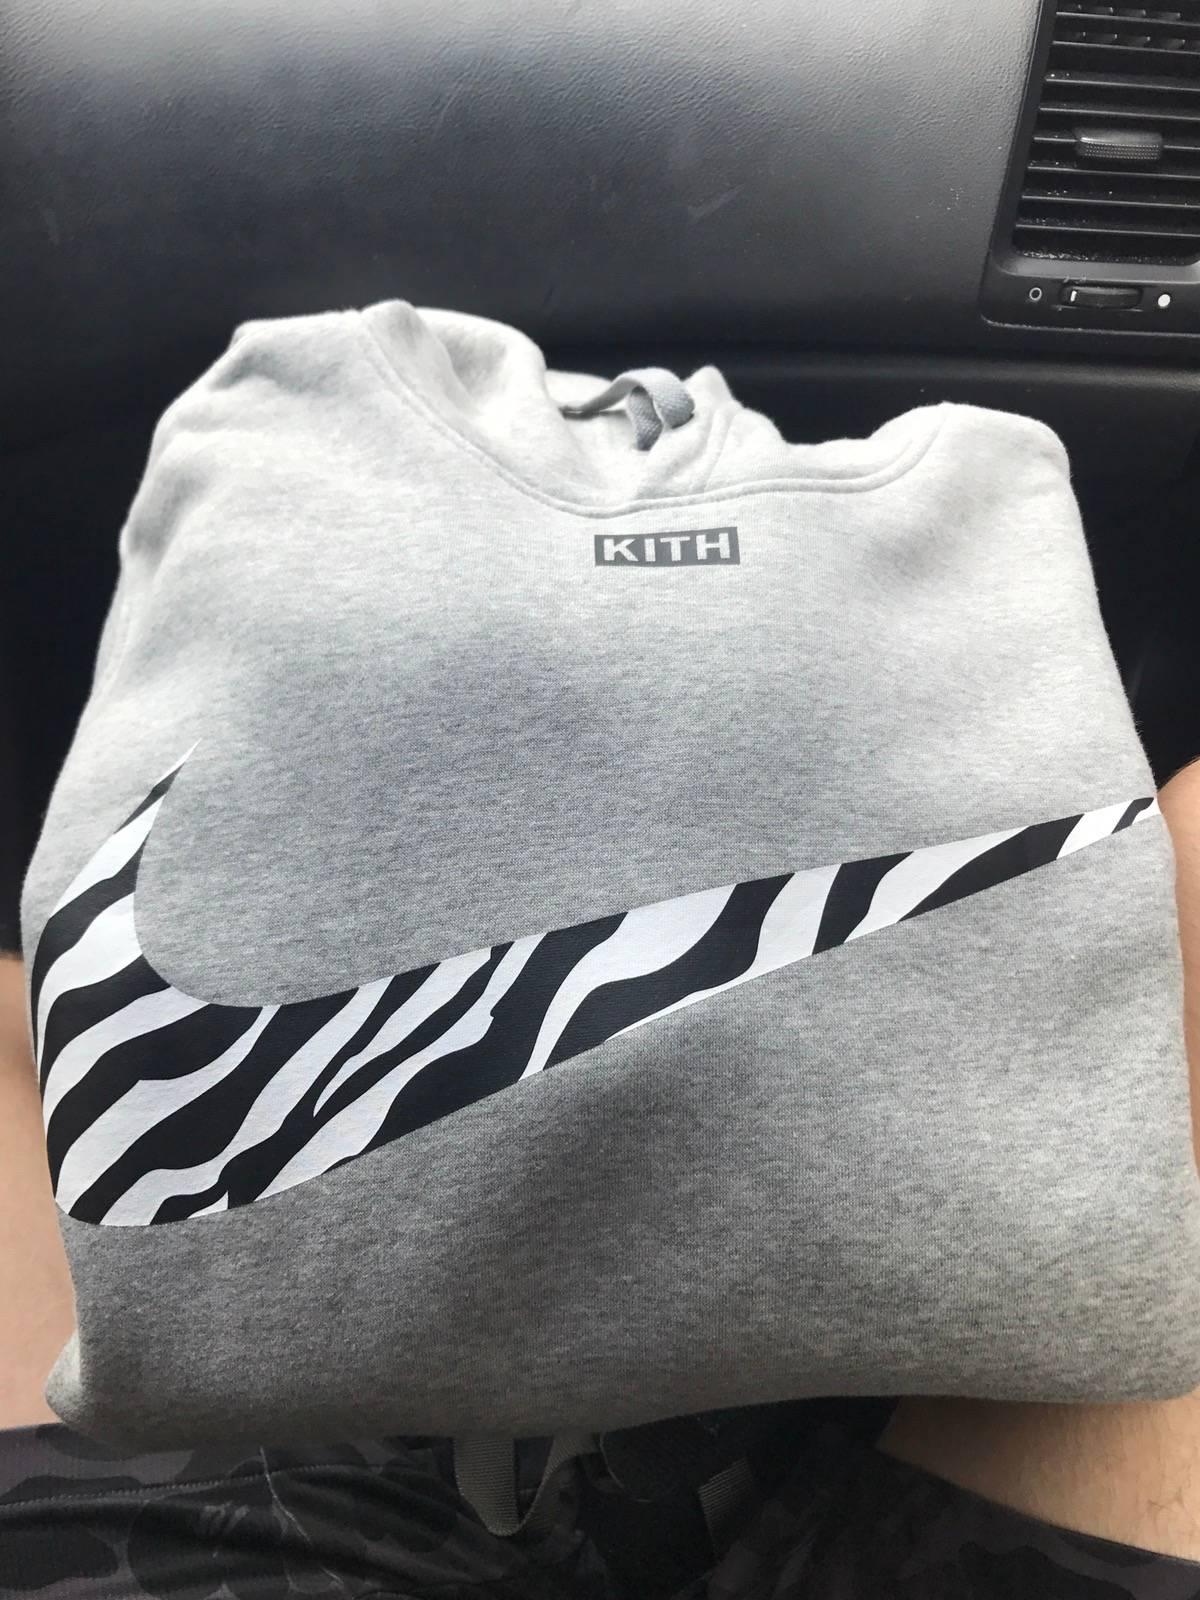 Kith X Nike Zebra Swoosh Tee Grey Size Small In Hand Ships Today